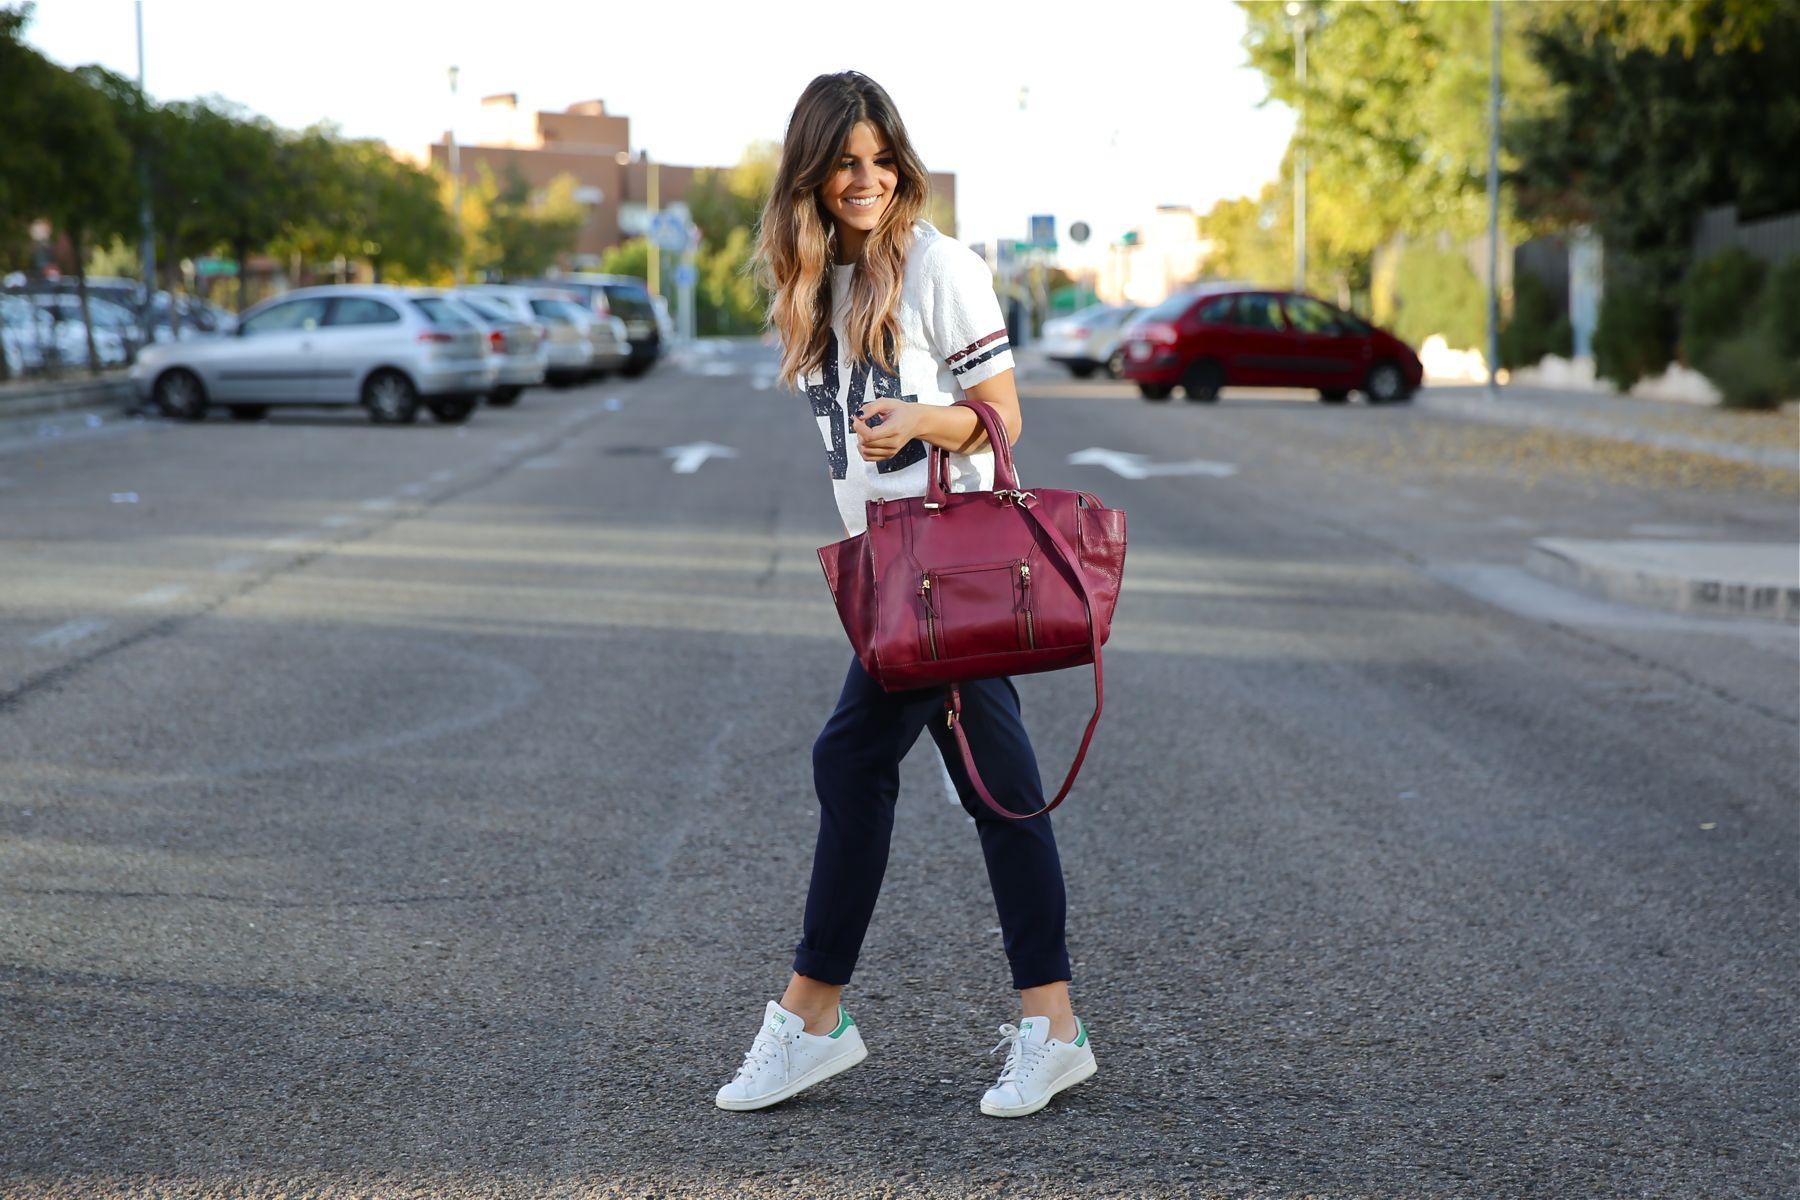 trendy_taste-look-outfit-street_style-ootd-blog-blogger-fashion_spain-moda_españa-zara-stan_smith-adidas-cosette-tee-baseball-camiseta-numero-pantalón-capri-pinzas-13